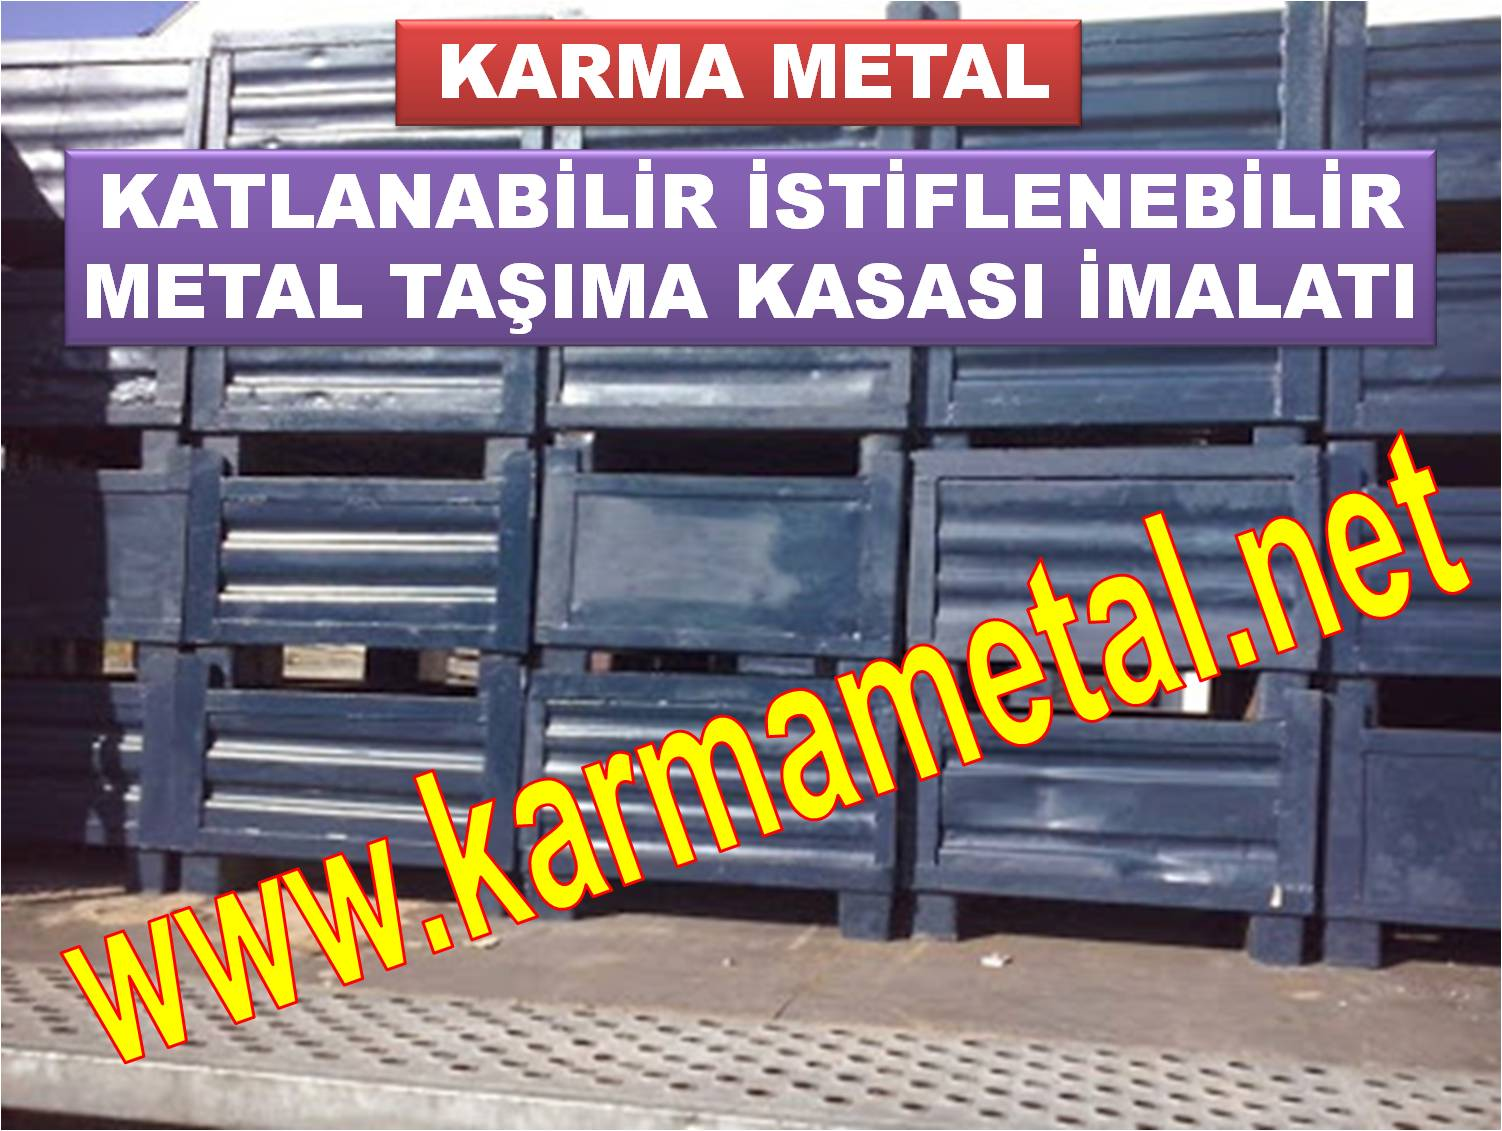 katlanabilir_istiflenebilir_metal_tasima_kasasi_sevkiyat_kasalari_istanbul (7)